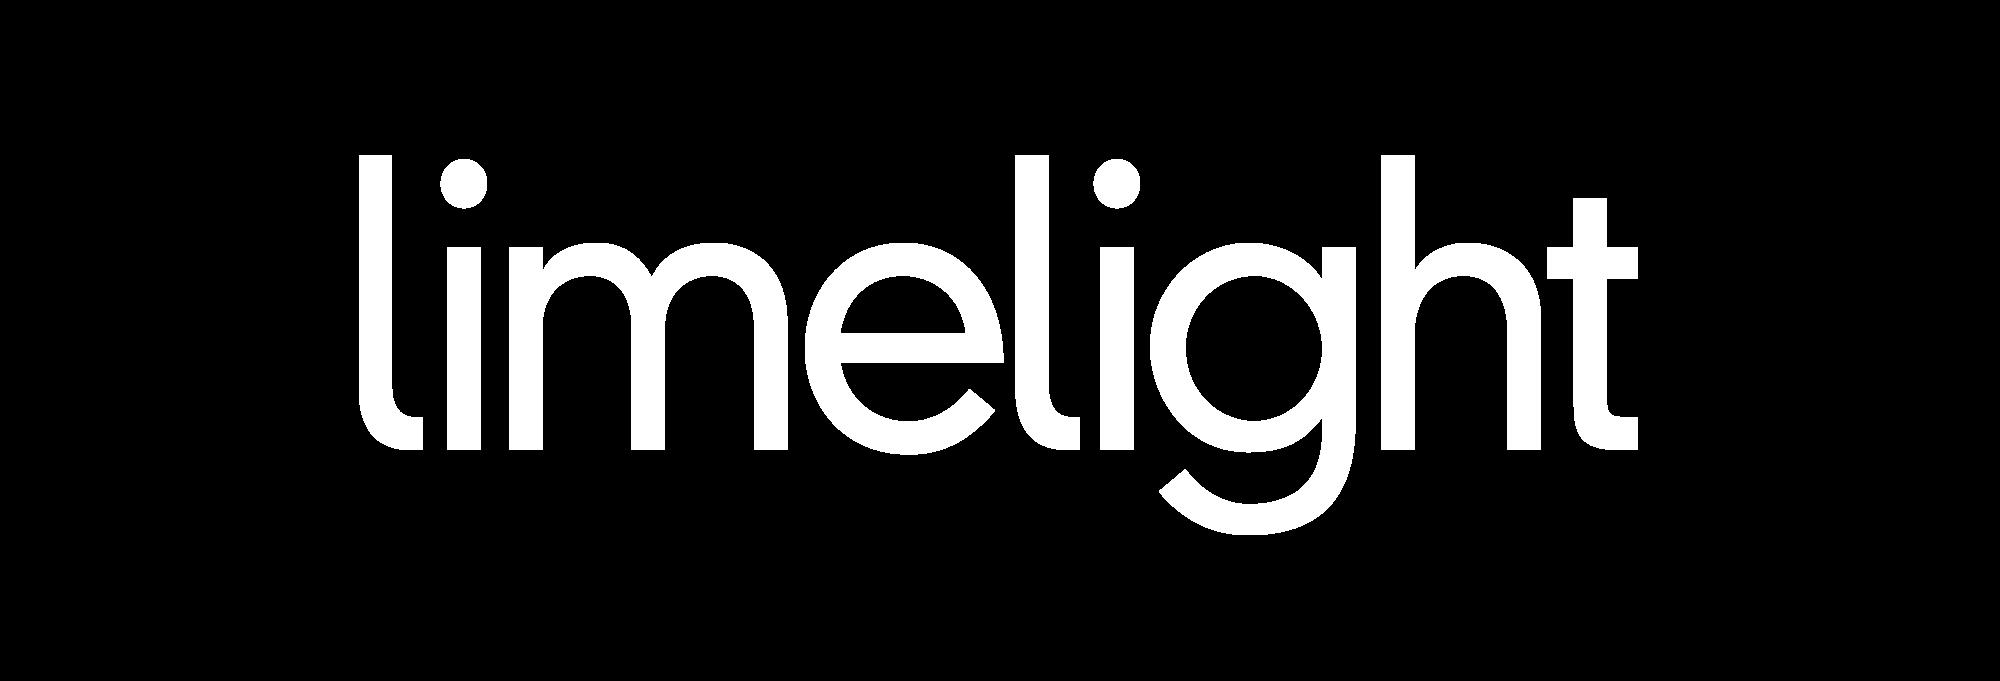 Limelight magazine